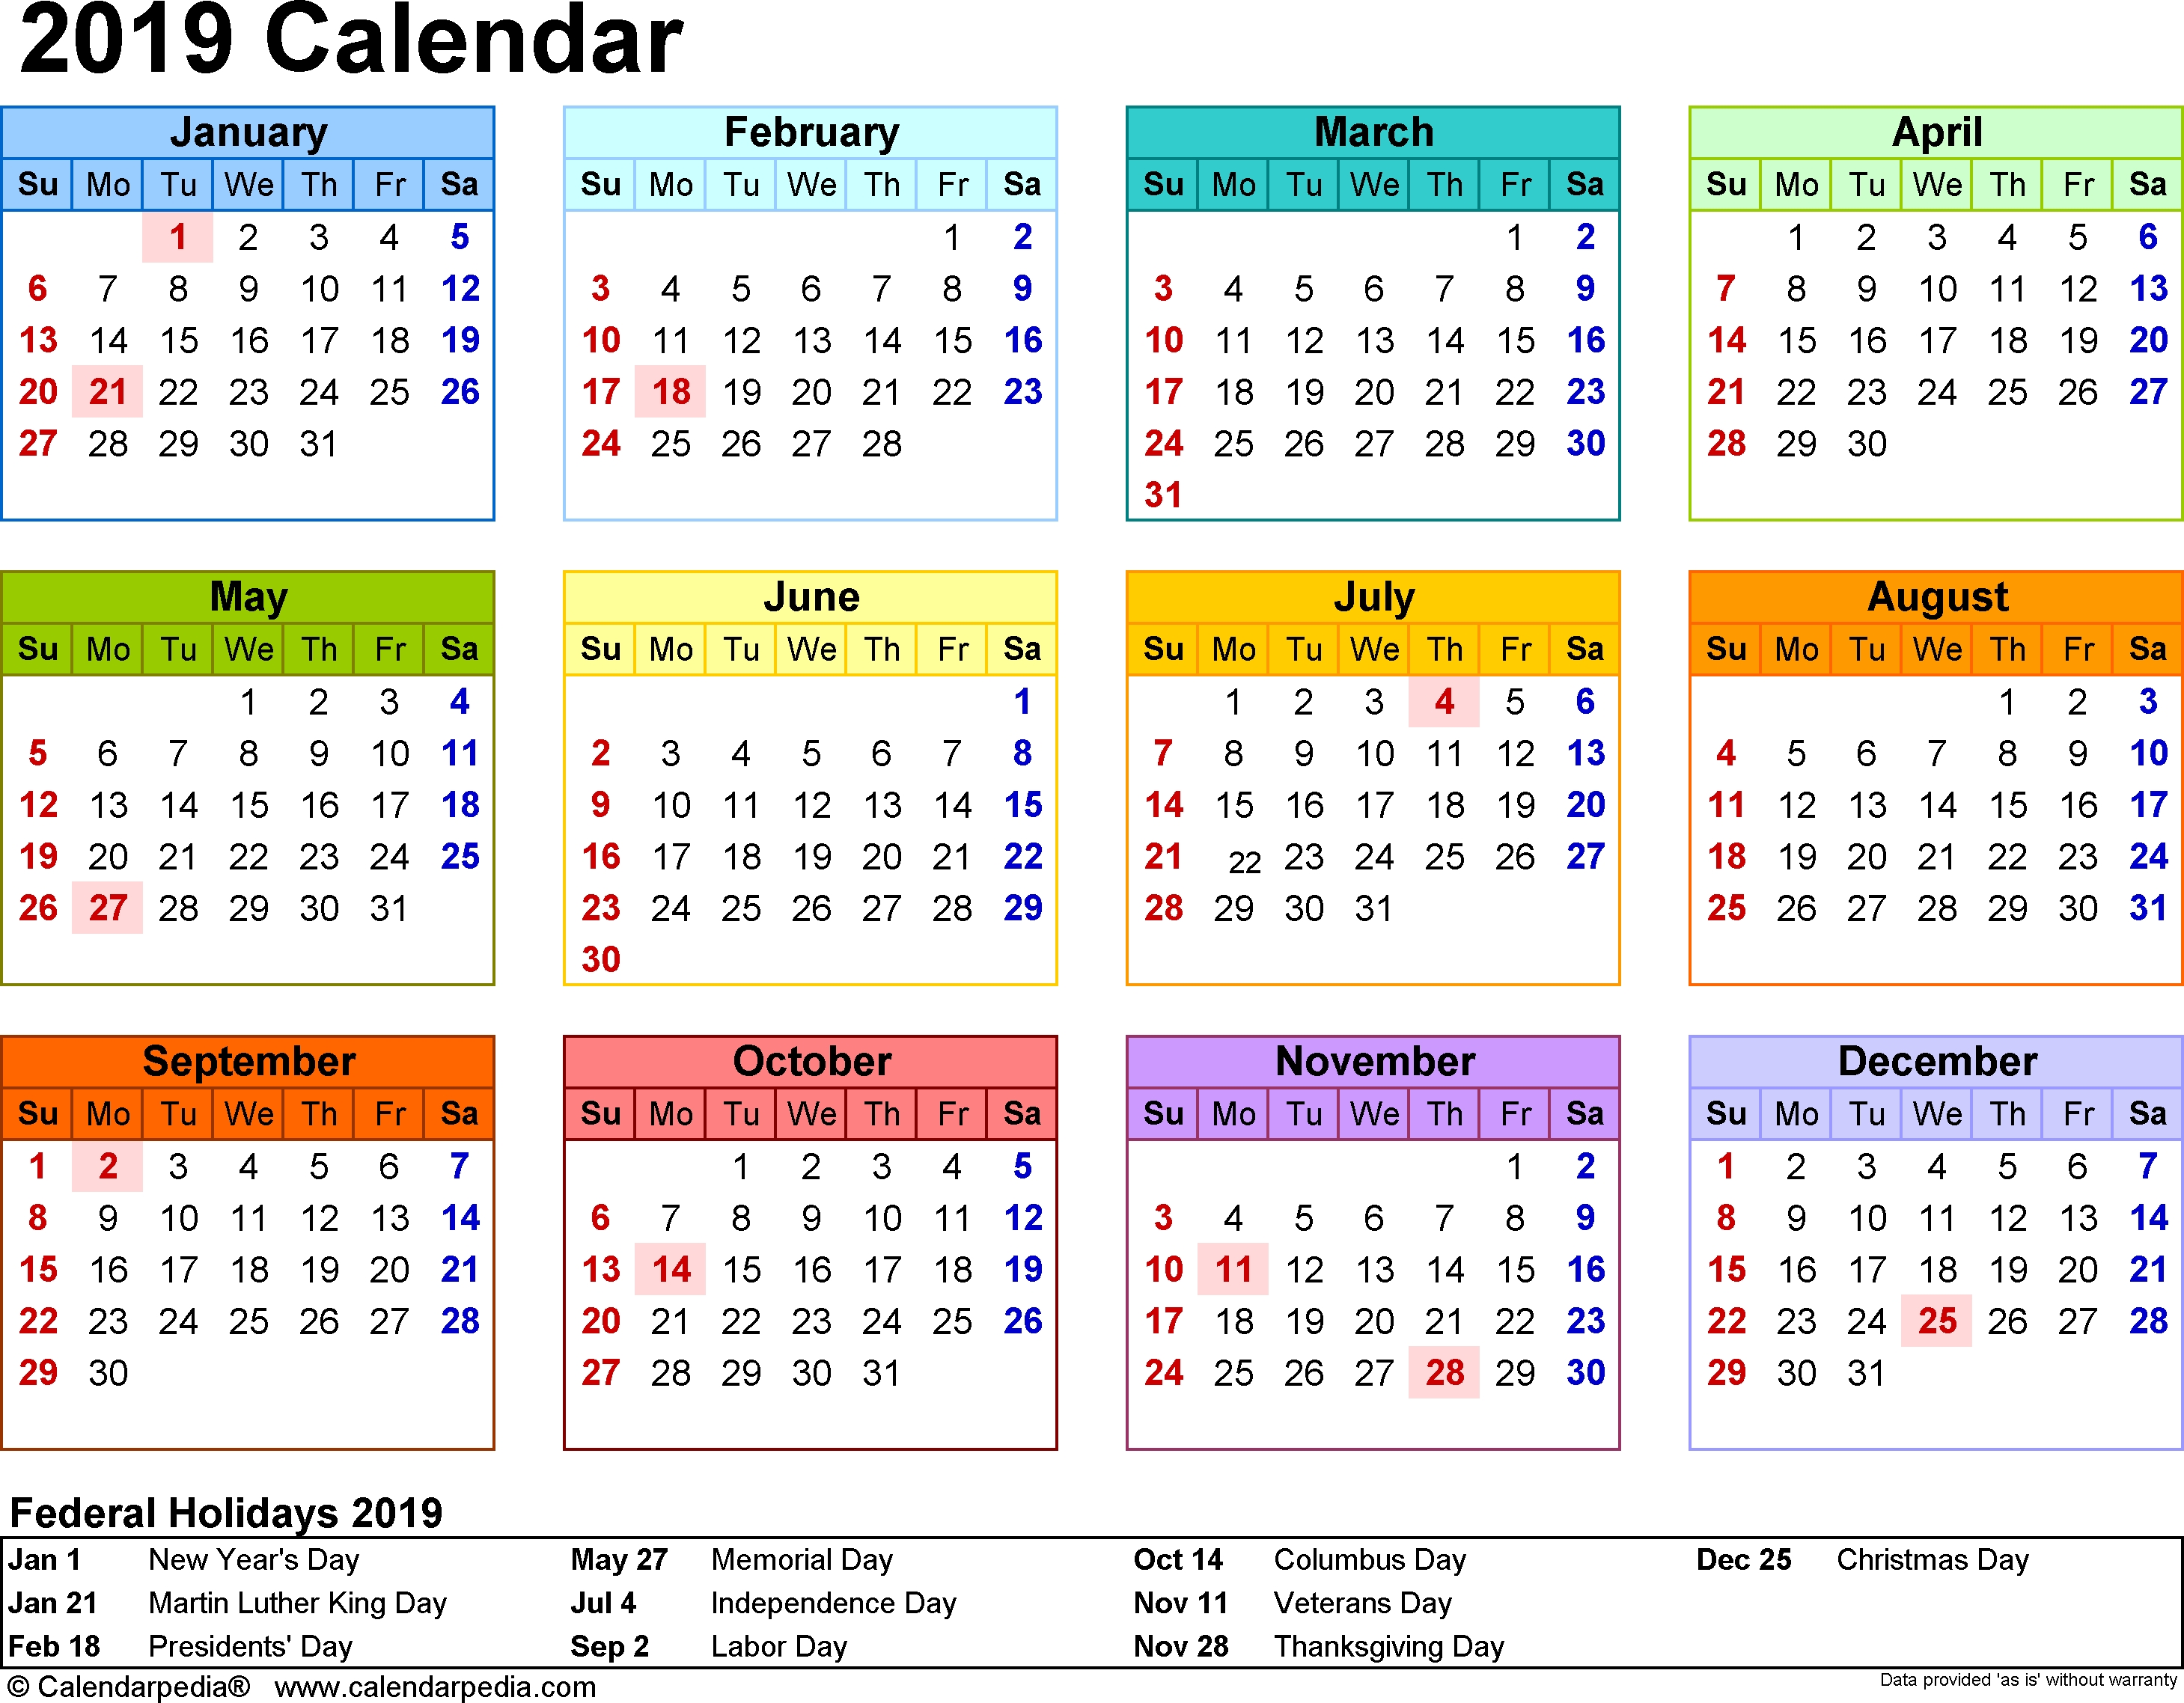 March 2019 Holiday Calendar Uk   2019 Calendars   Calendar-Printable Calendar 2020 School Holidays Qld